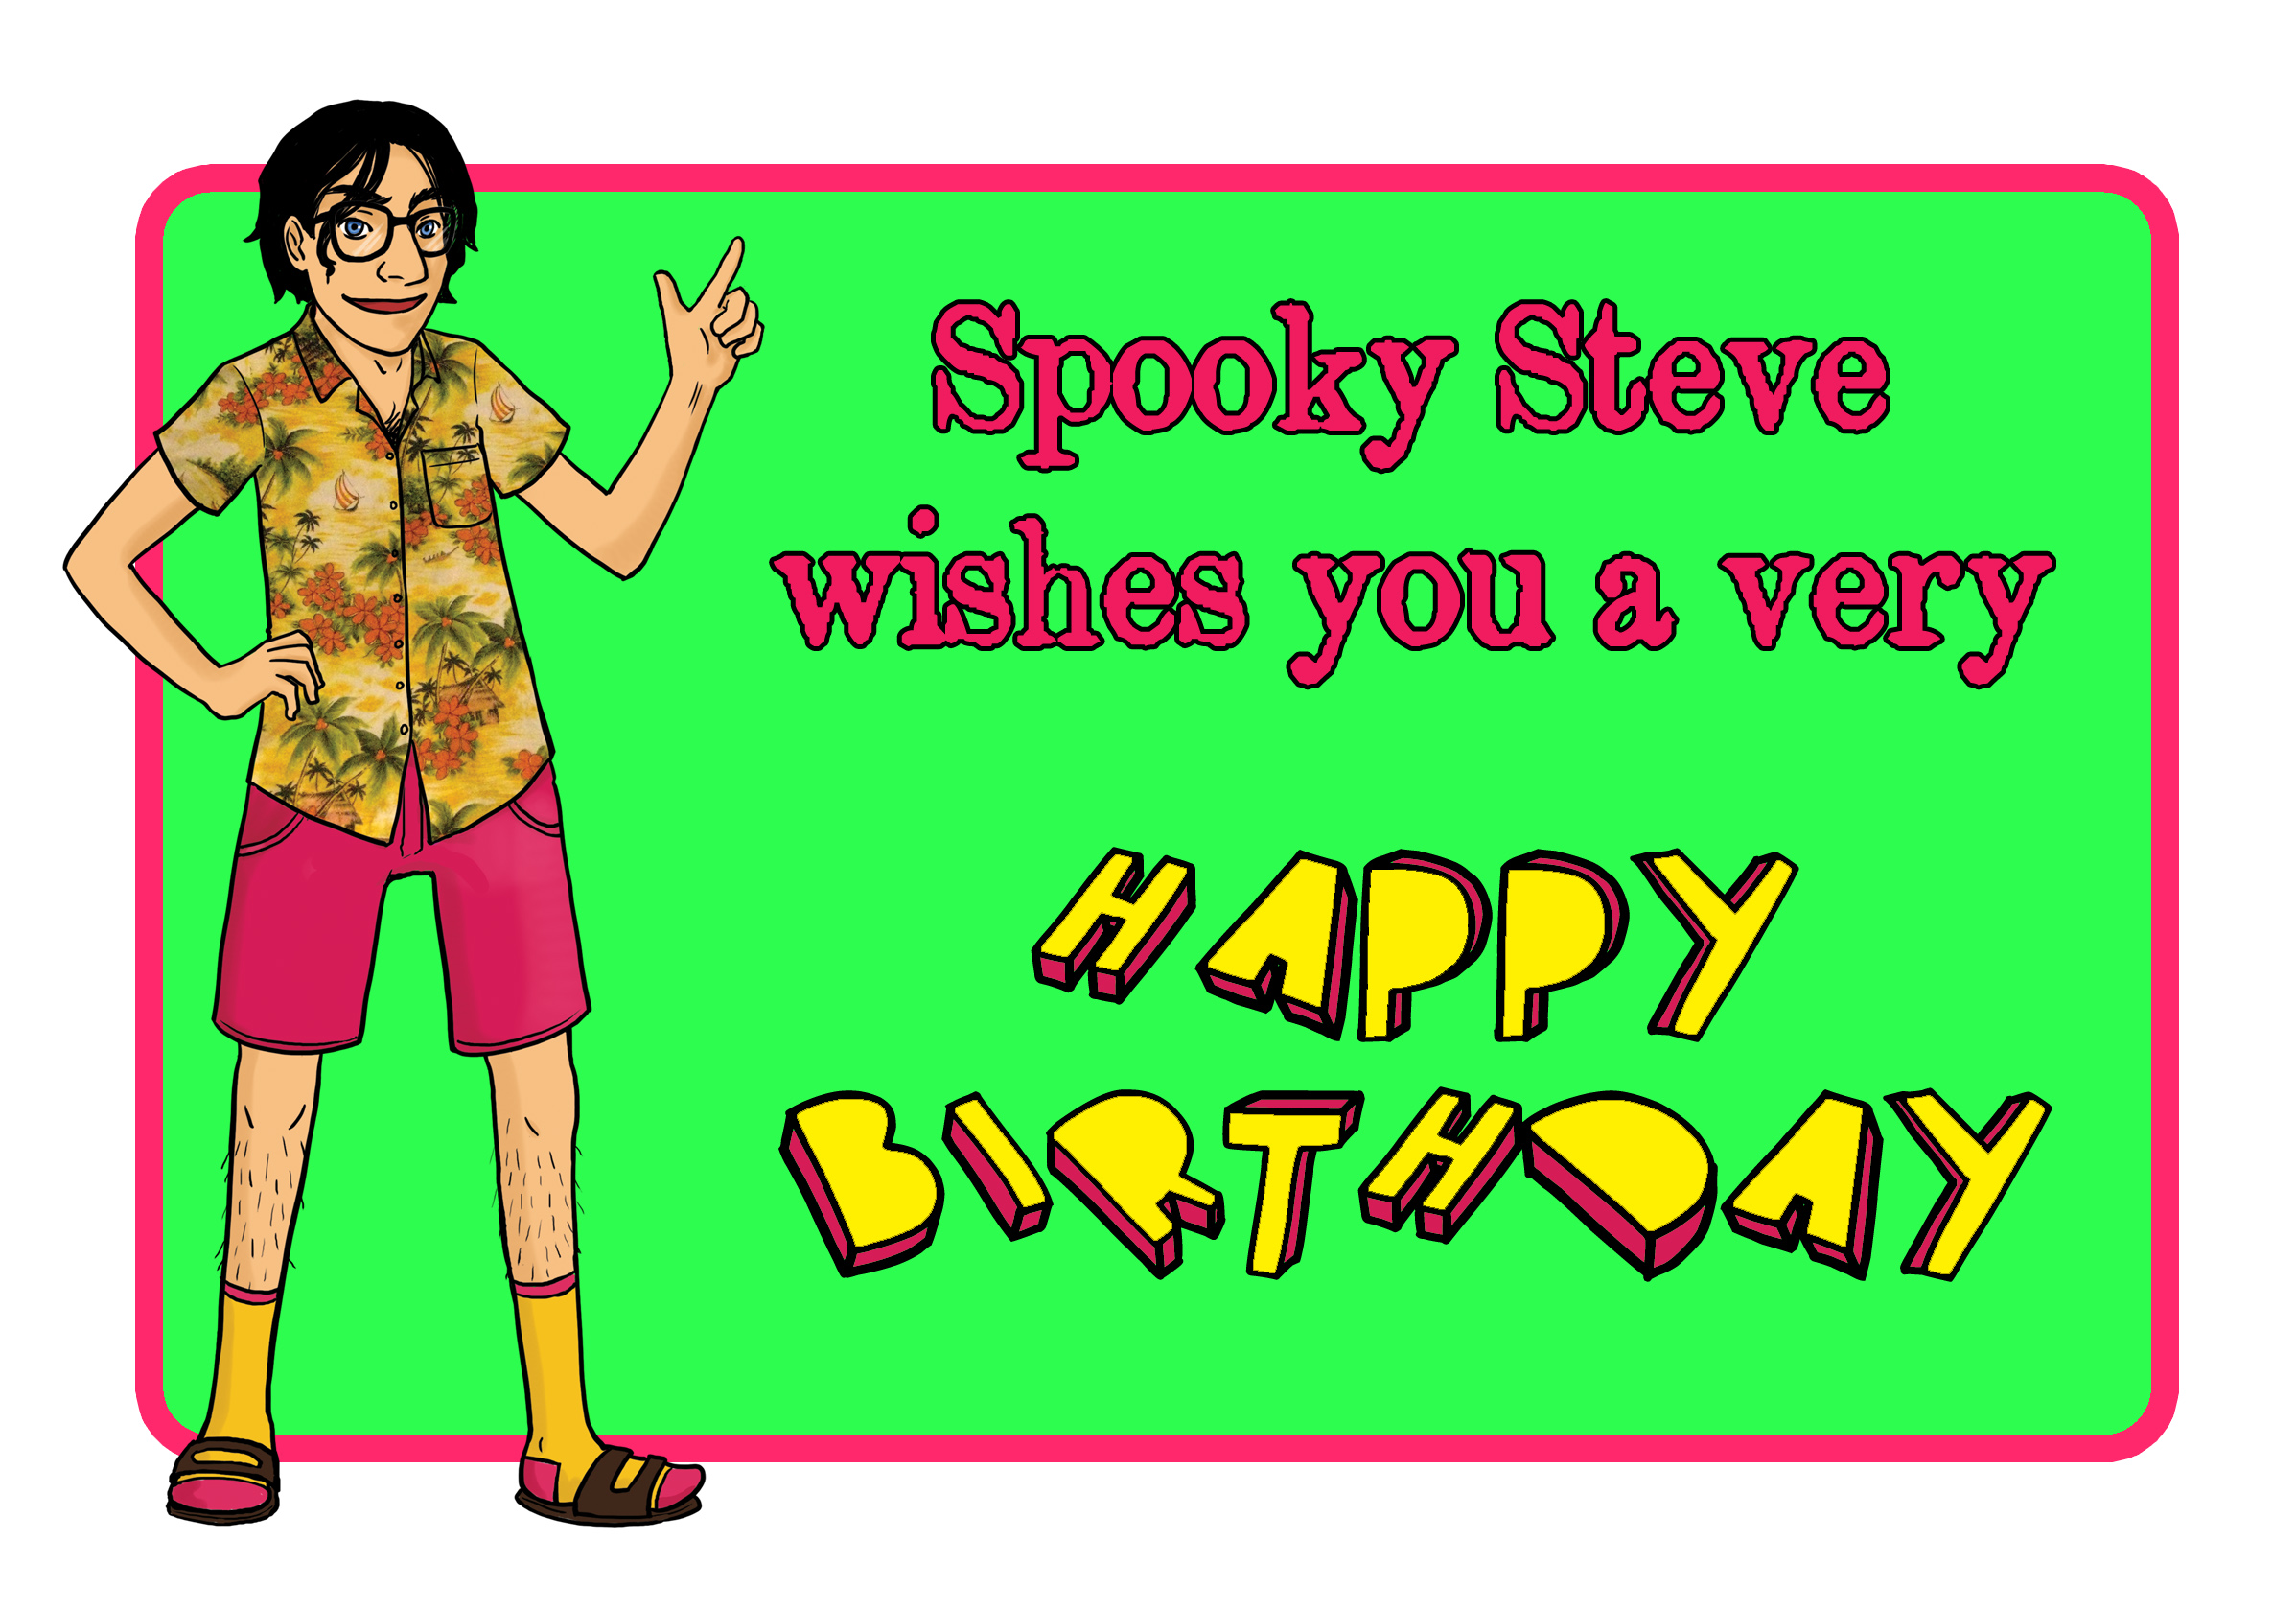 Spooky Steve